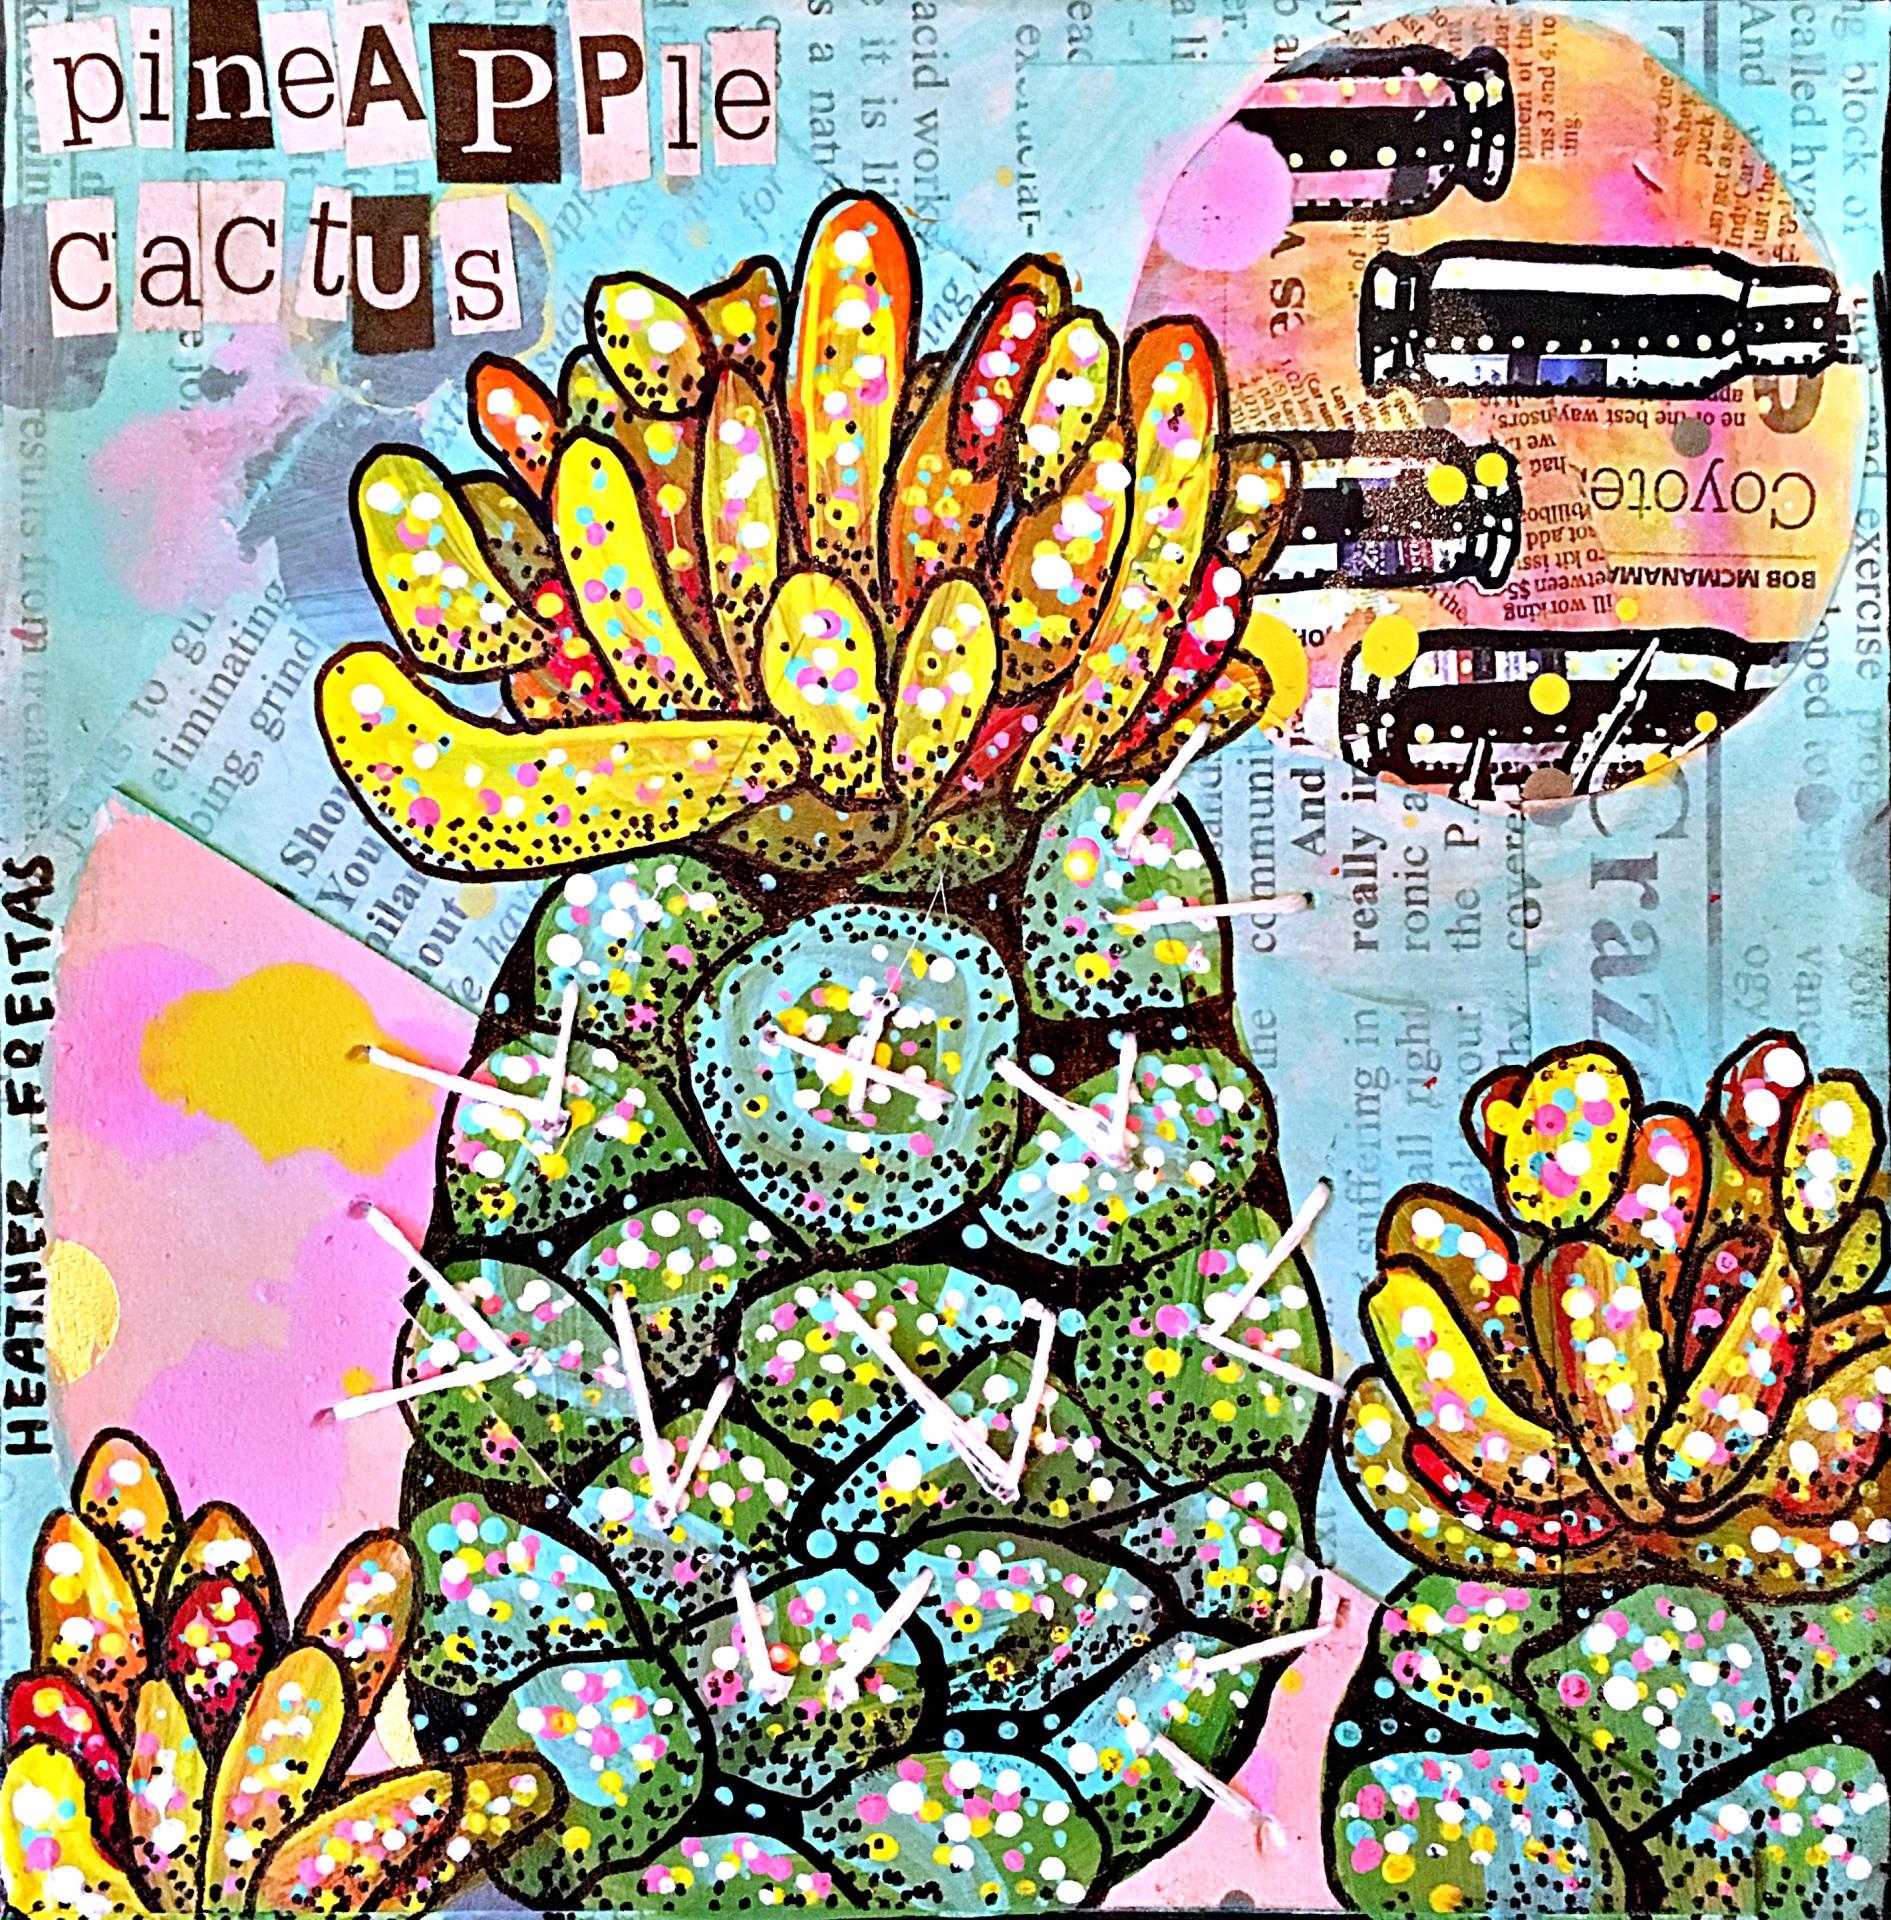 Pineapple Cactus